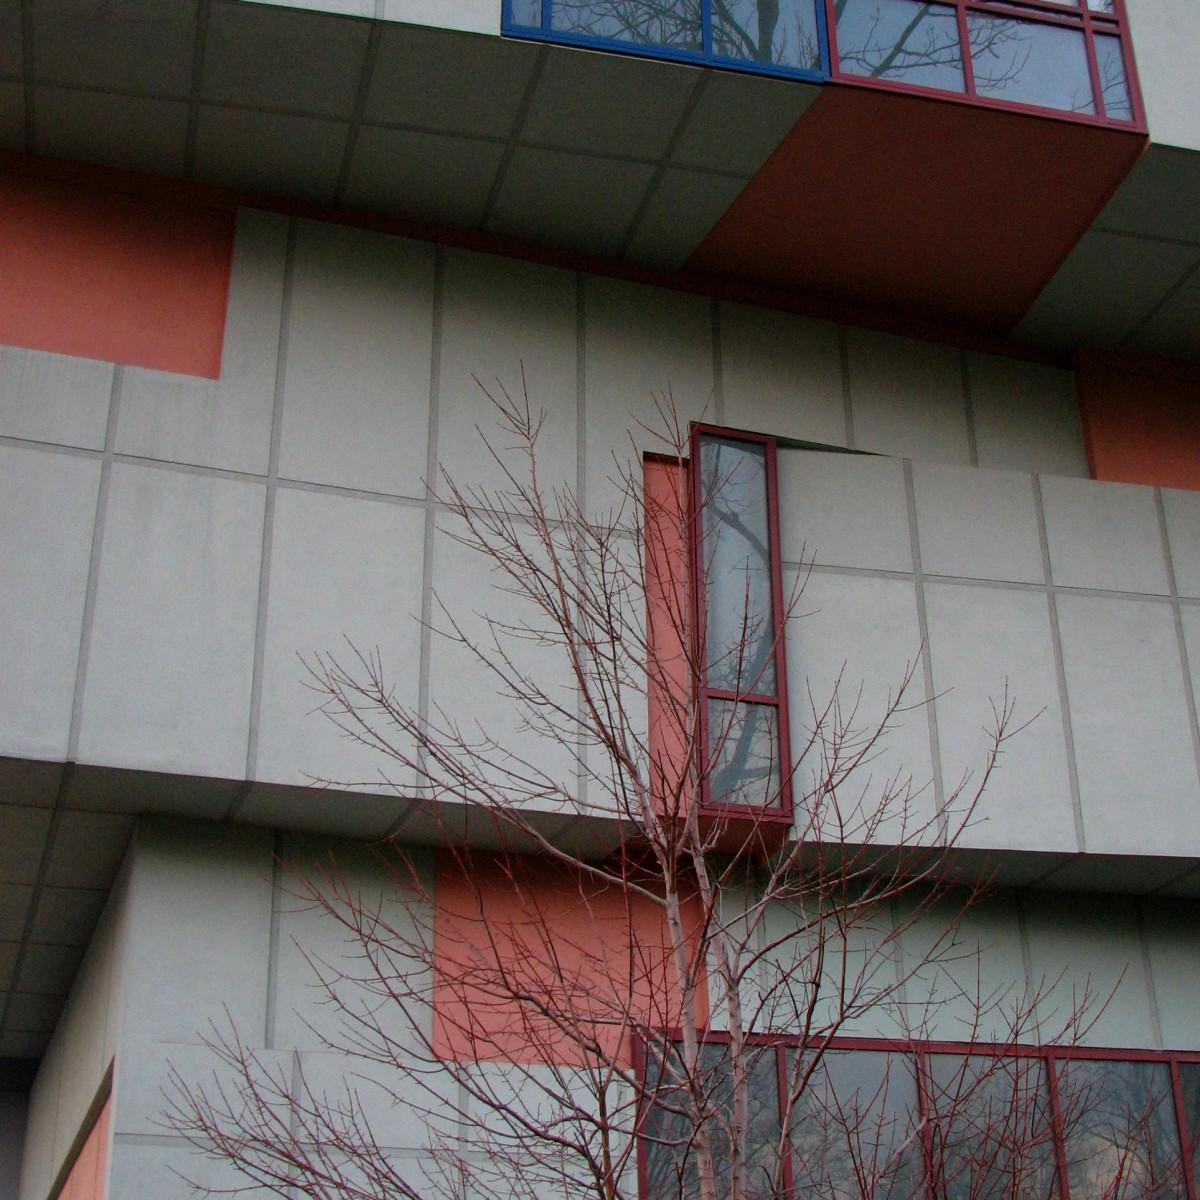 Hobby Line Glas Design New Art : Free images architecture building orange line red